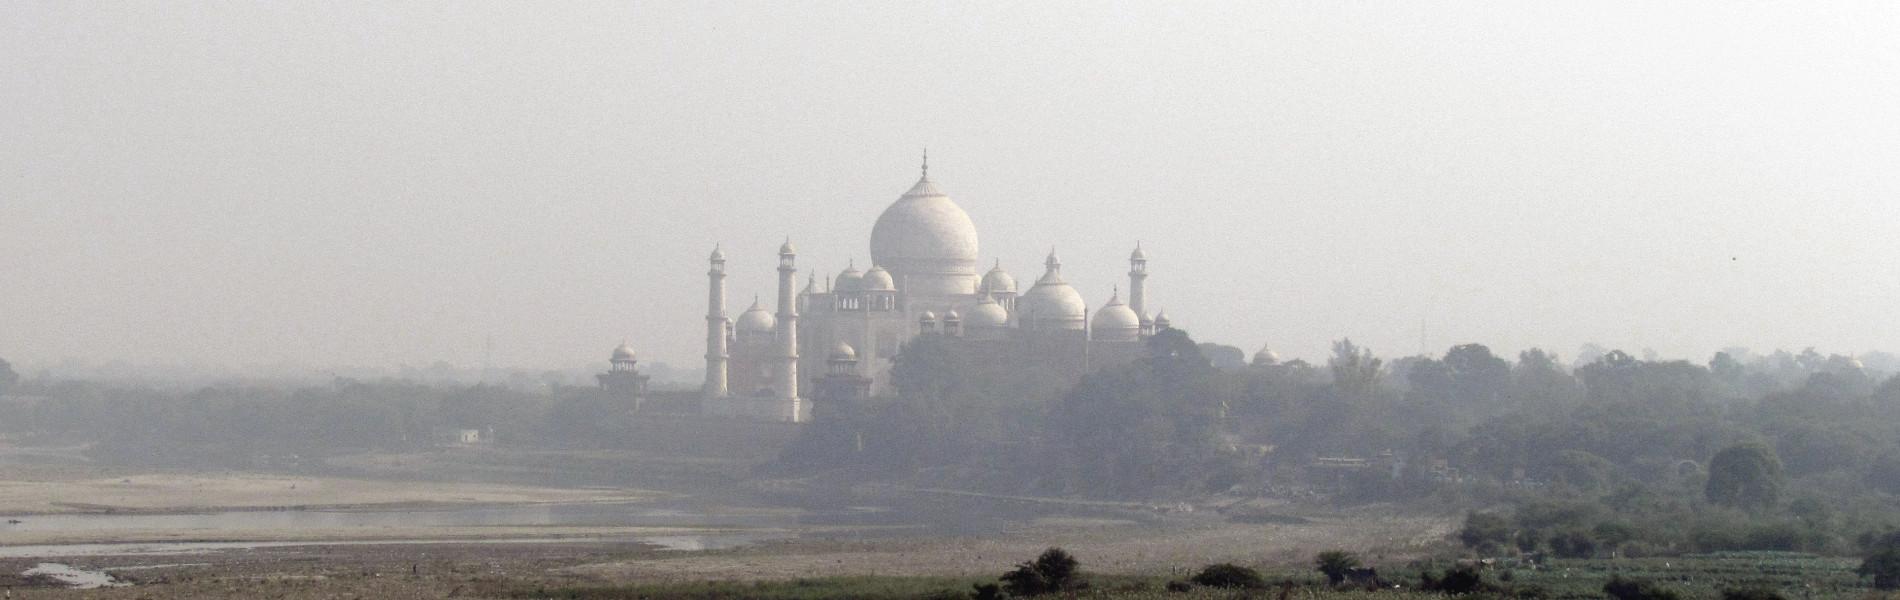 Taj Mahal - Índia